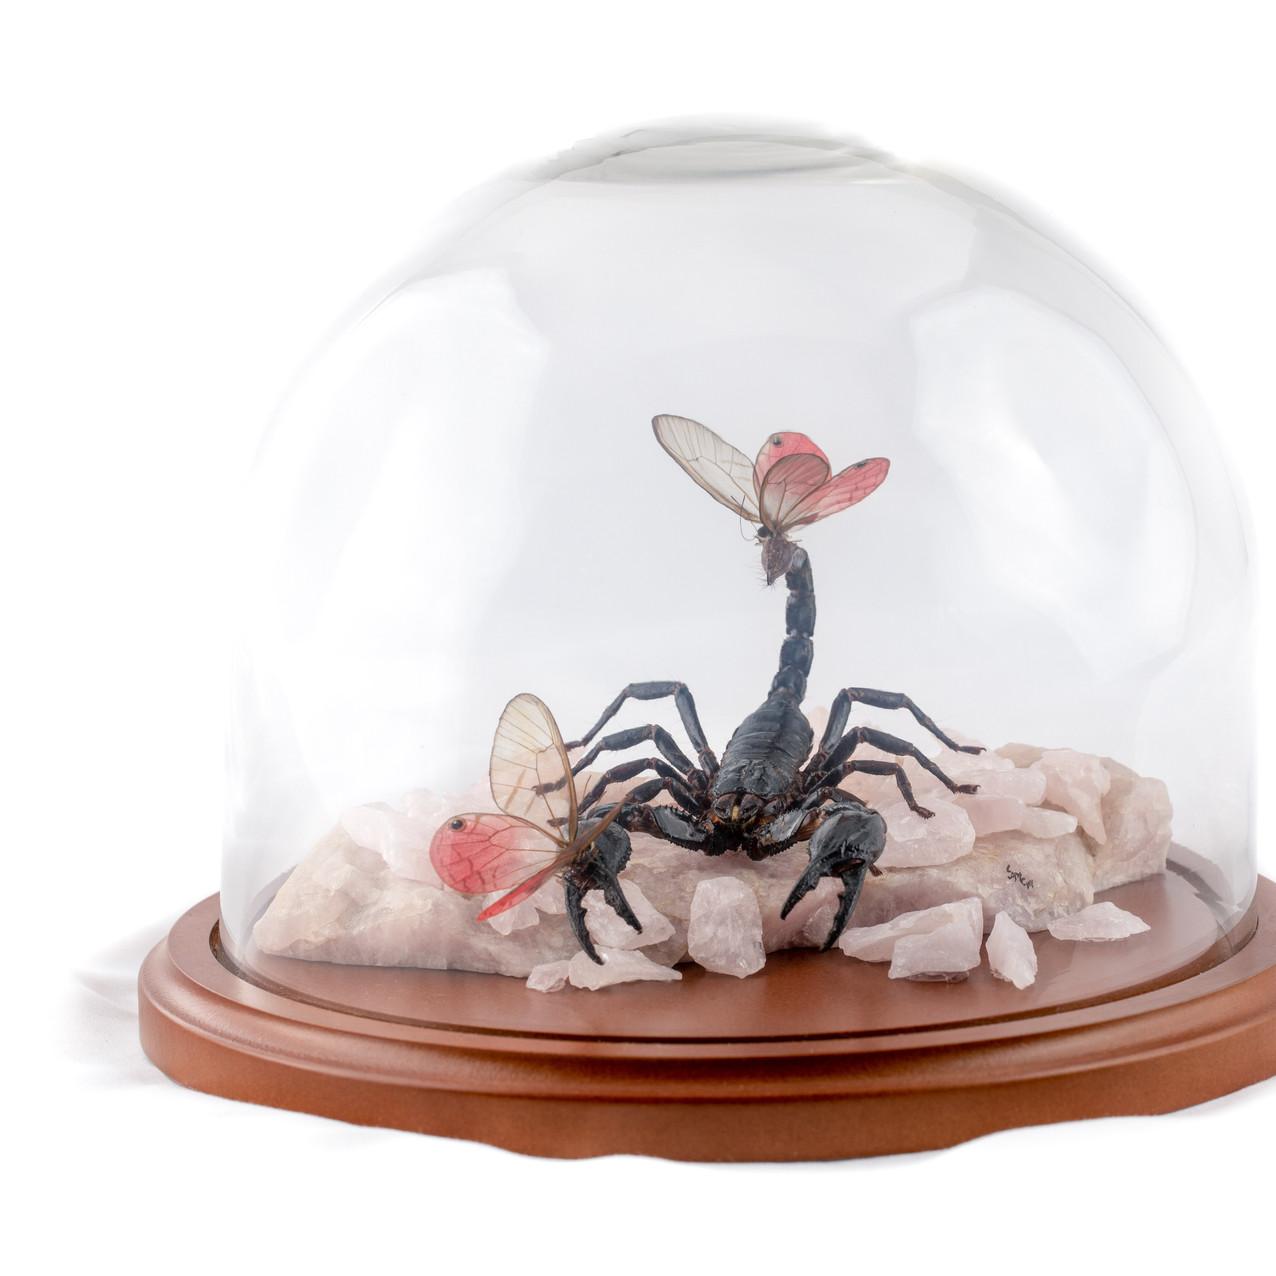 Forest Scorpion with Poseys, Rose Quartz